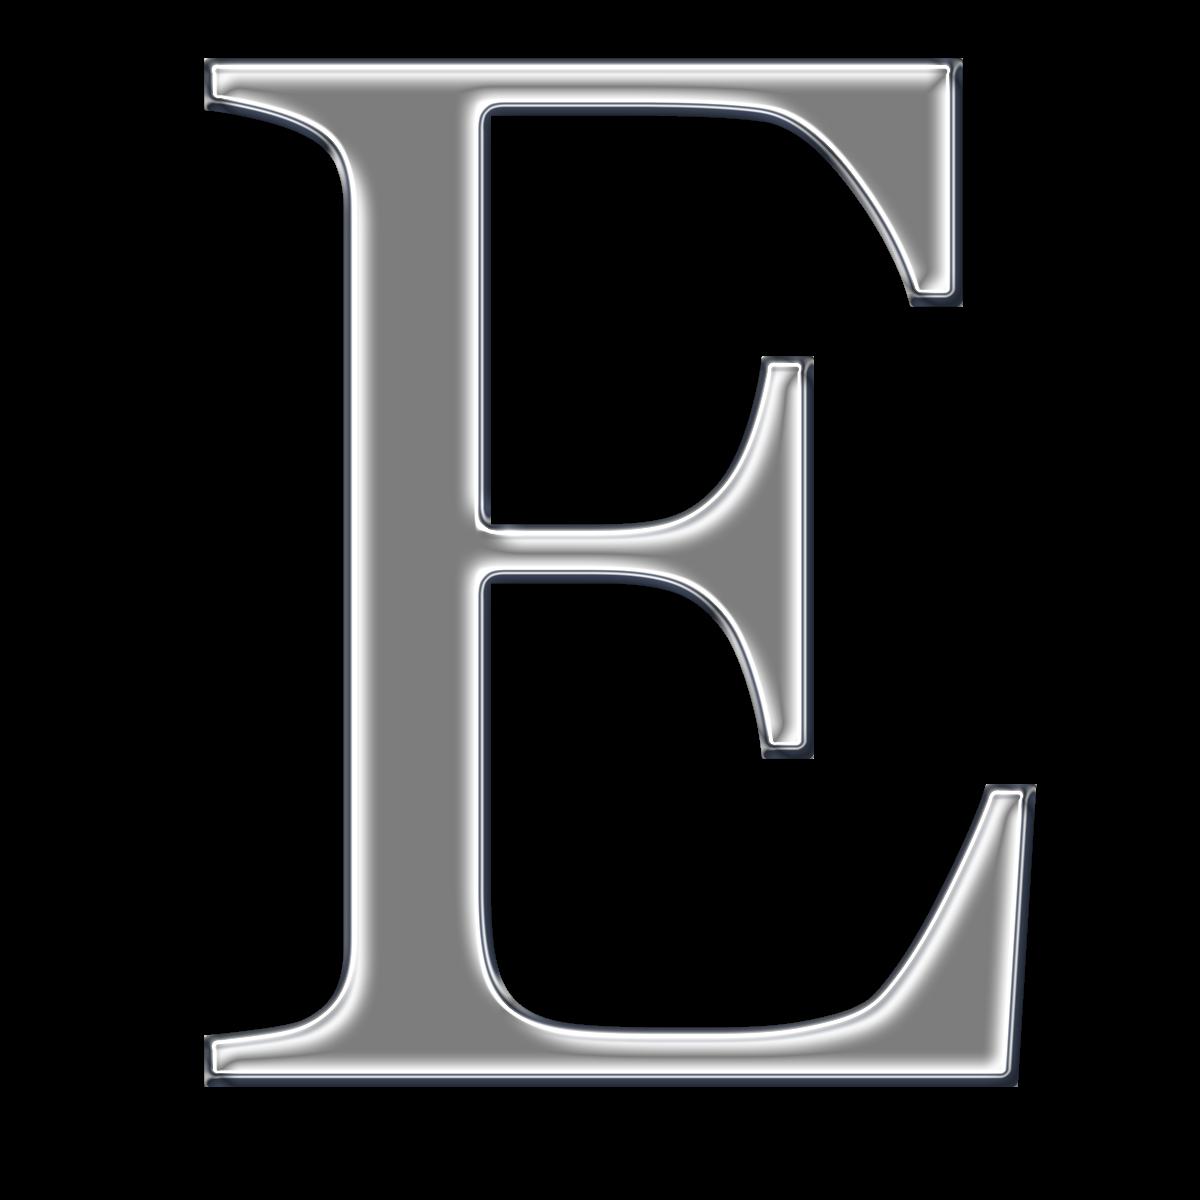 Http1bpspot eojjlpaj1rit8eec0fok3iaaaaaaaaaf4 explore capital alphabet letter e and more spiritdancerdesigns Choice Image